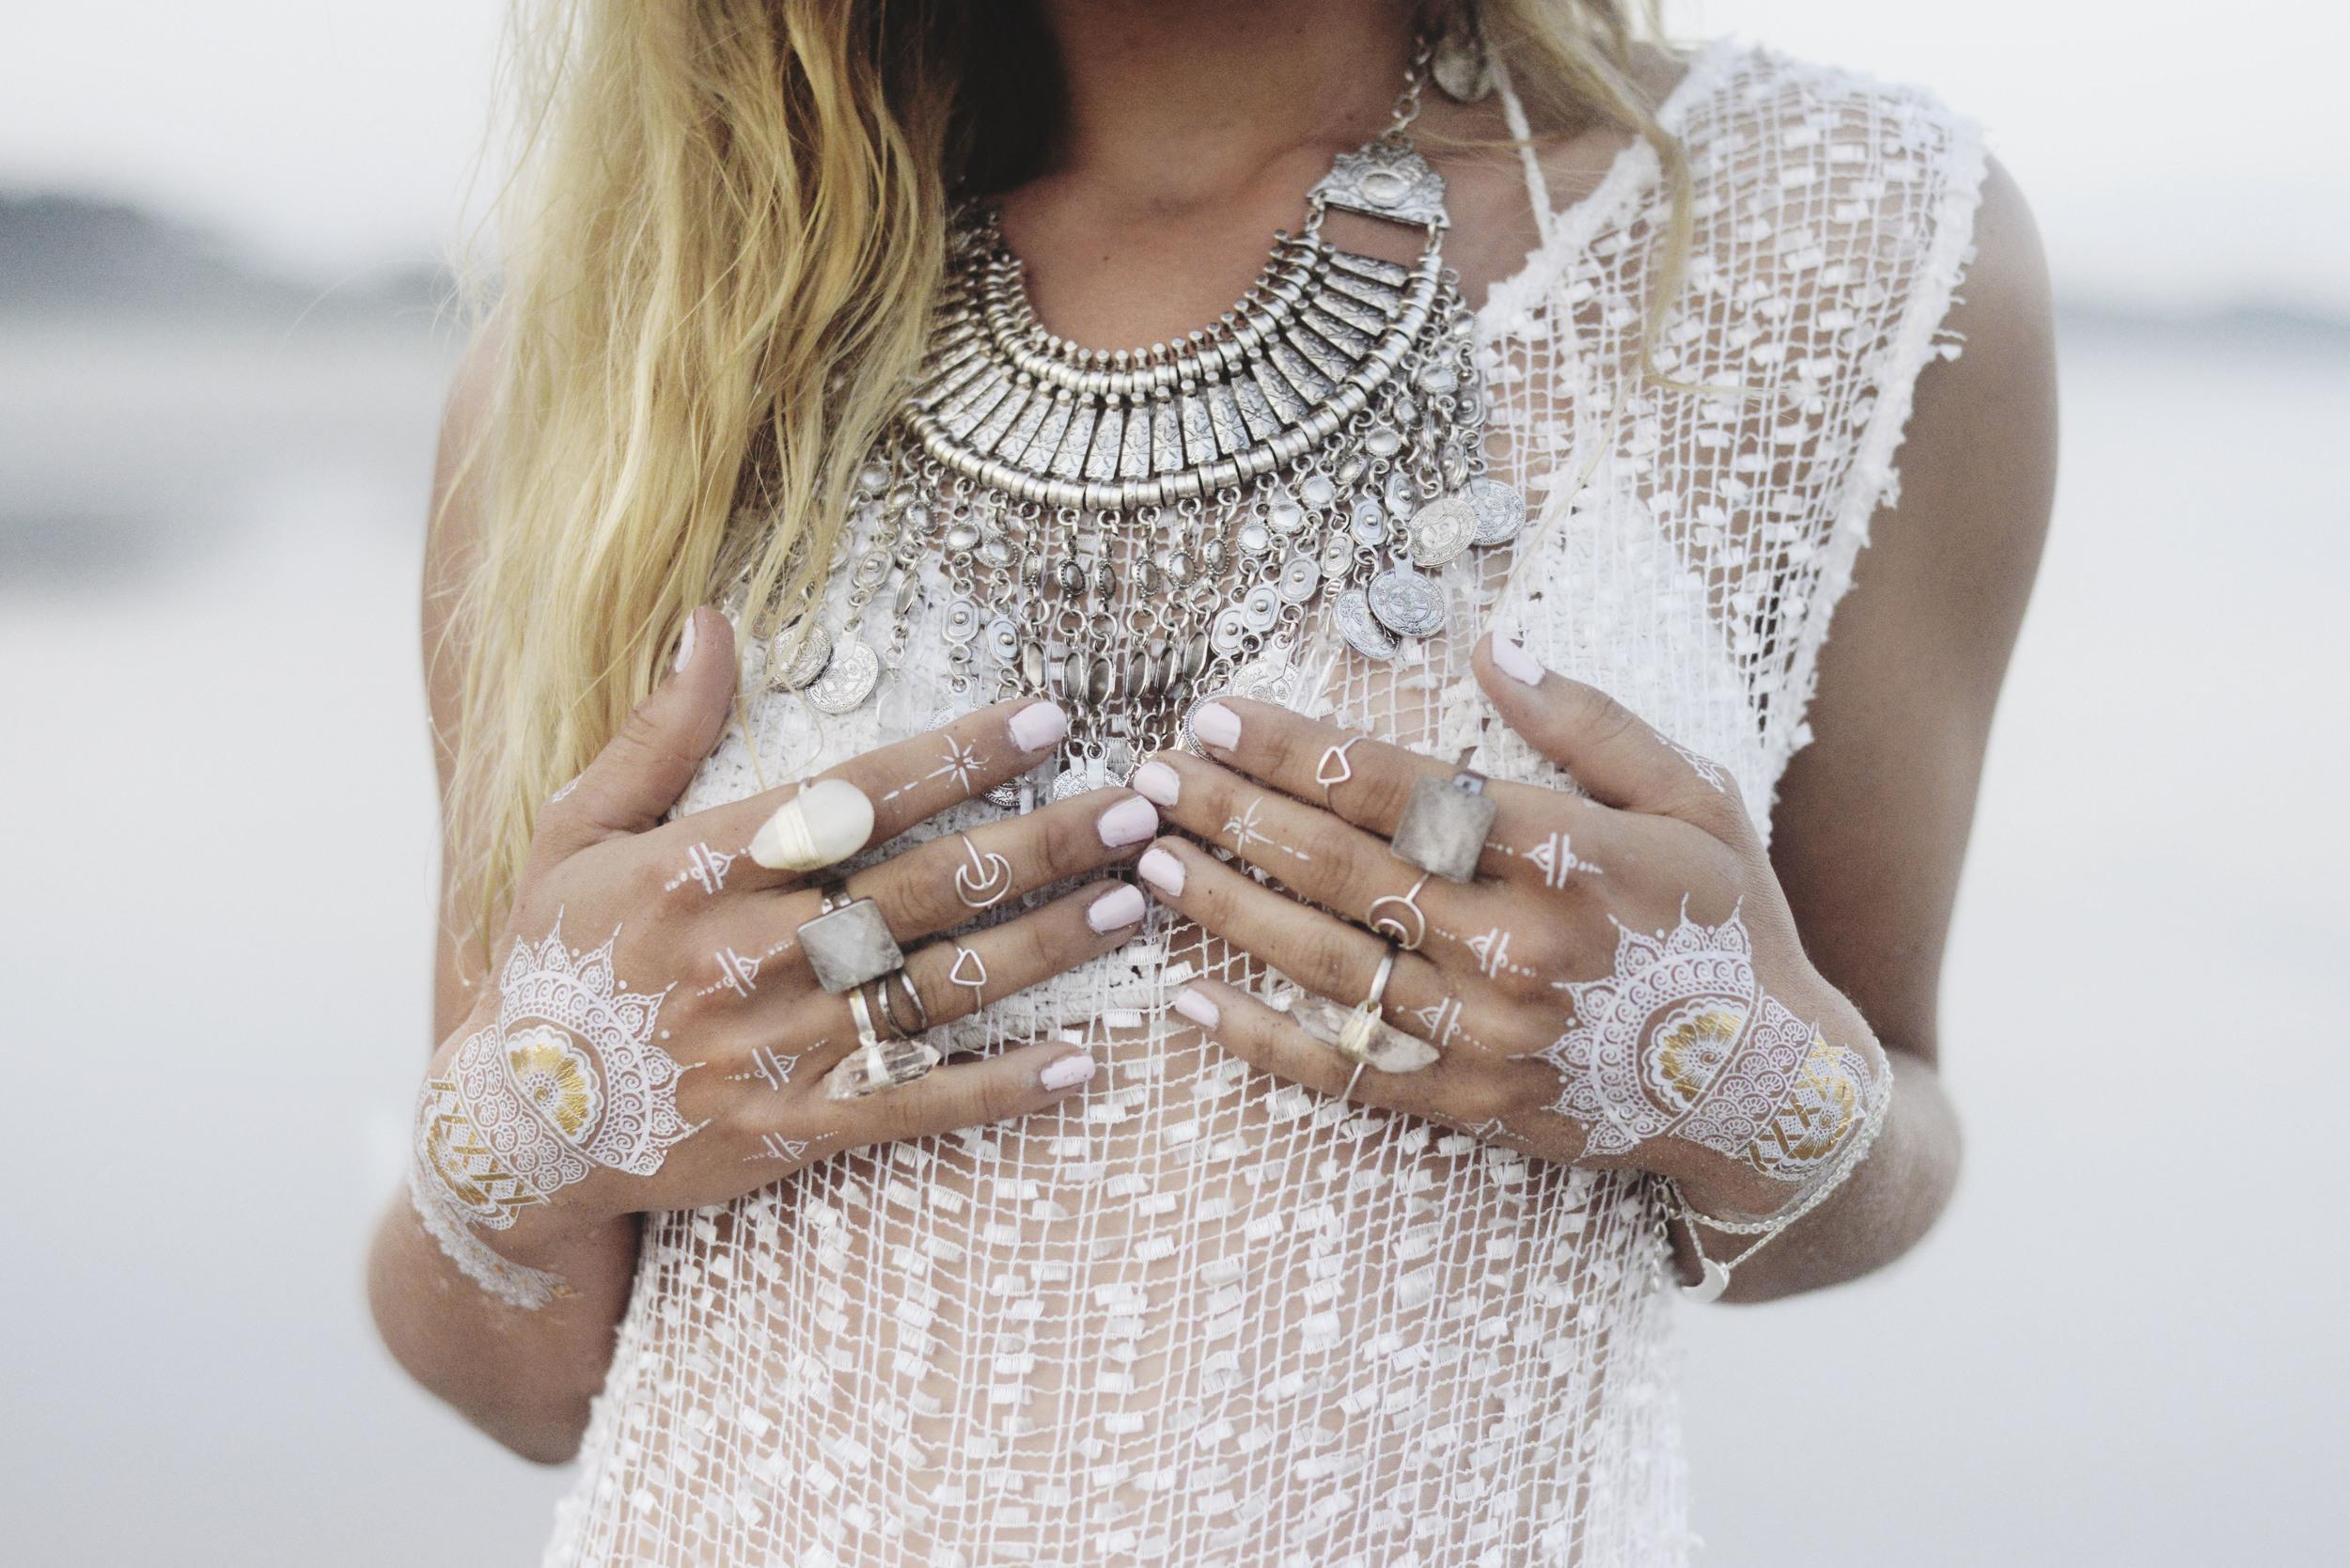 hands close up 1.jpg